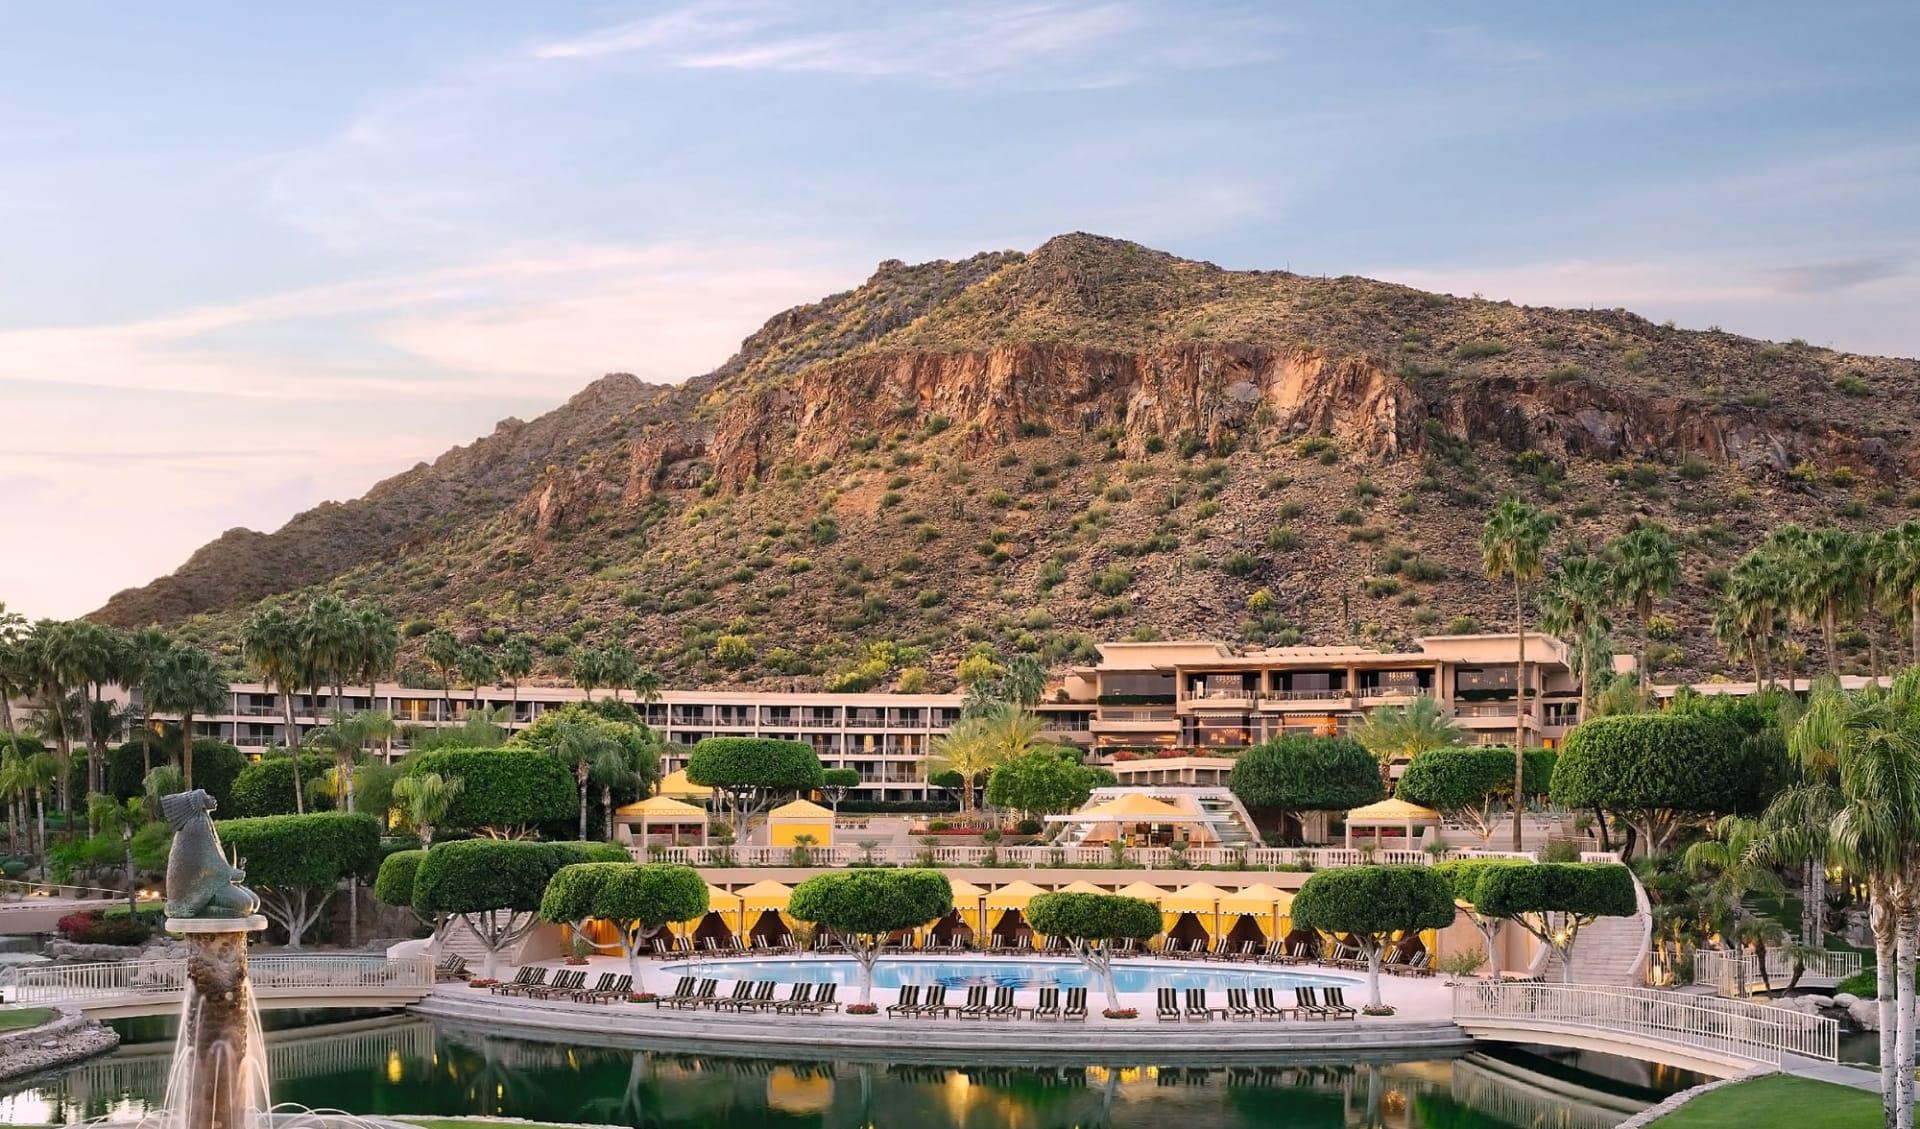 The Phoenician in Scottsdale: The Phoenician - Aussenansicht